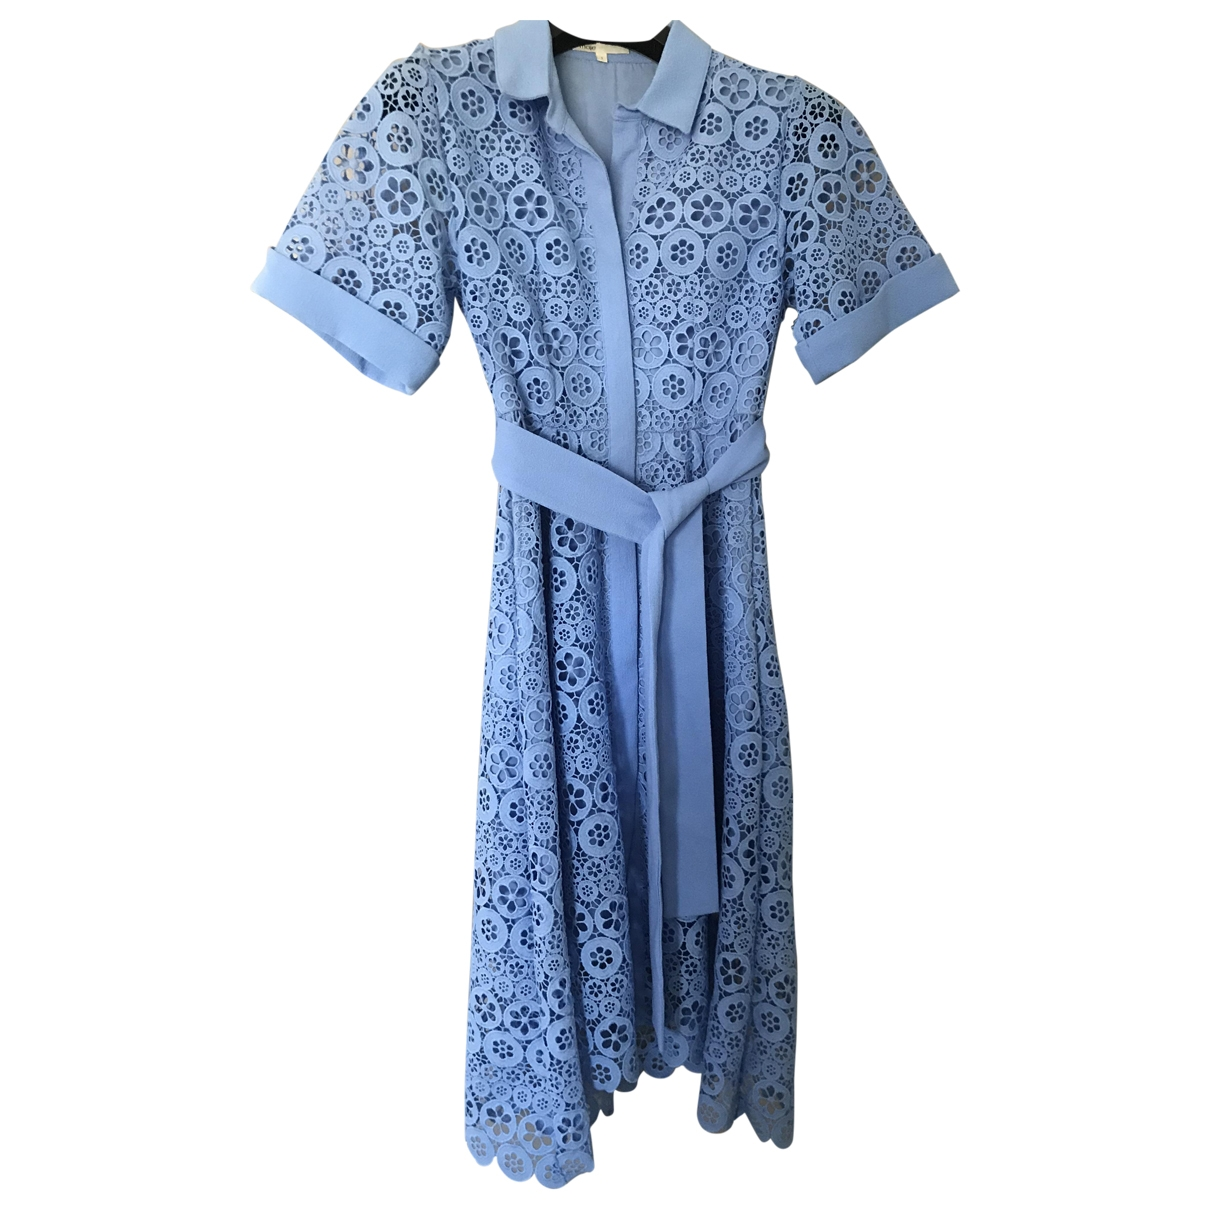 Maje Spring Summer 2020 Kleid in  Blau Polyester